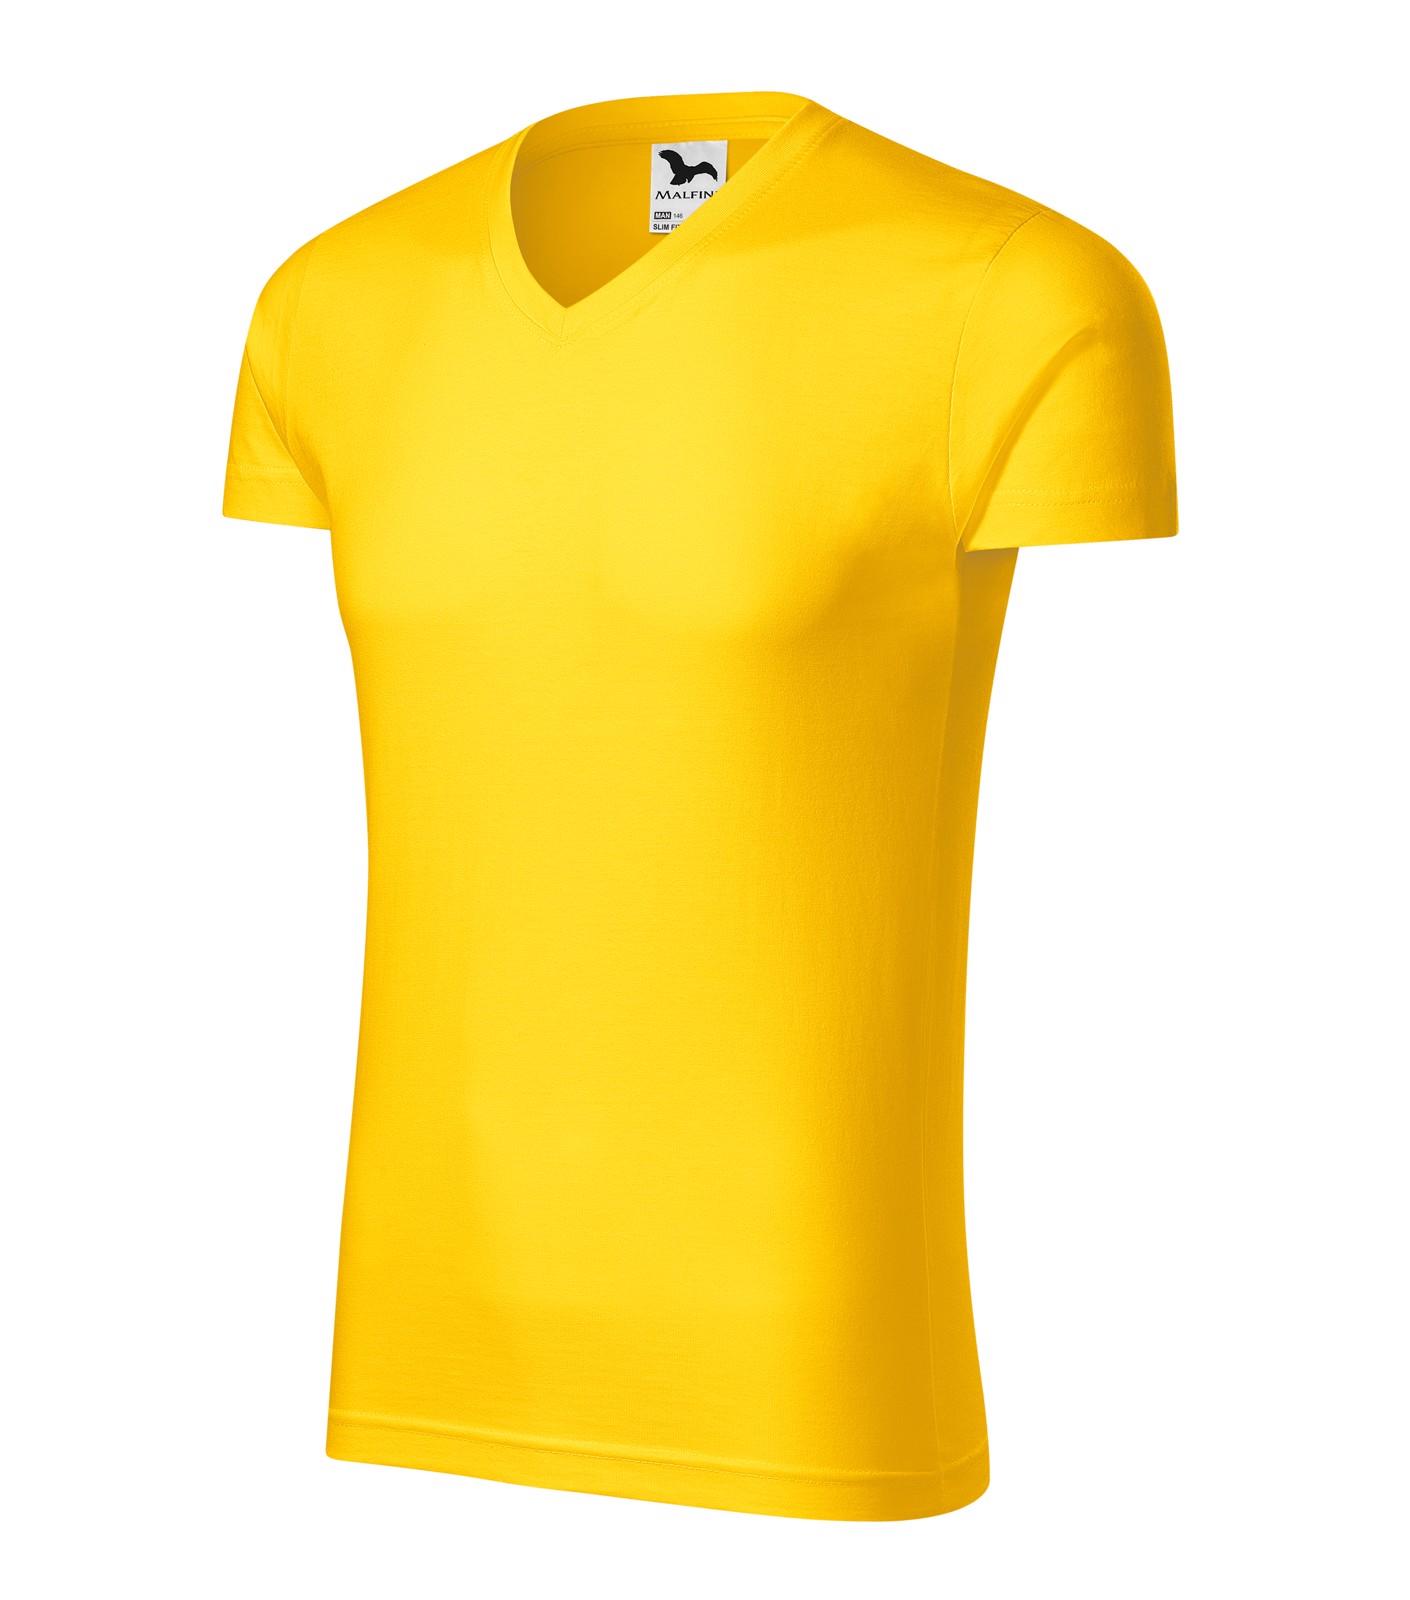 Tričko pánské Malfini Slim Fit V-neck - Žlutá / XL